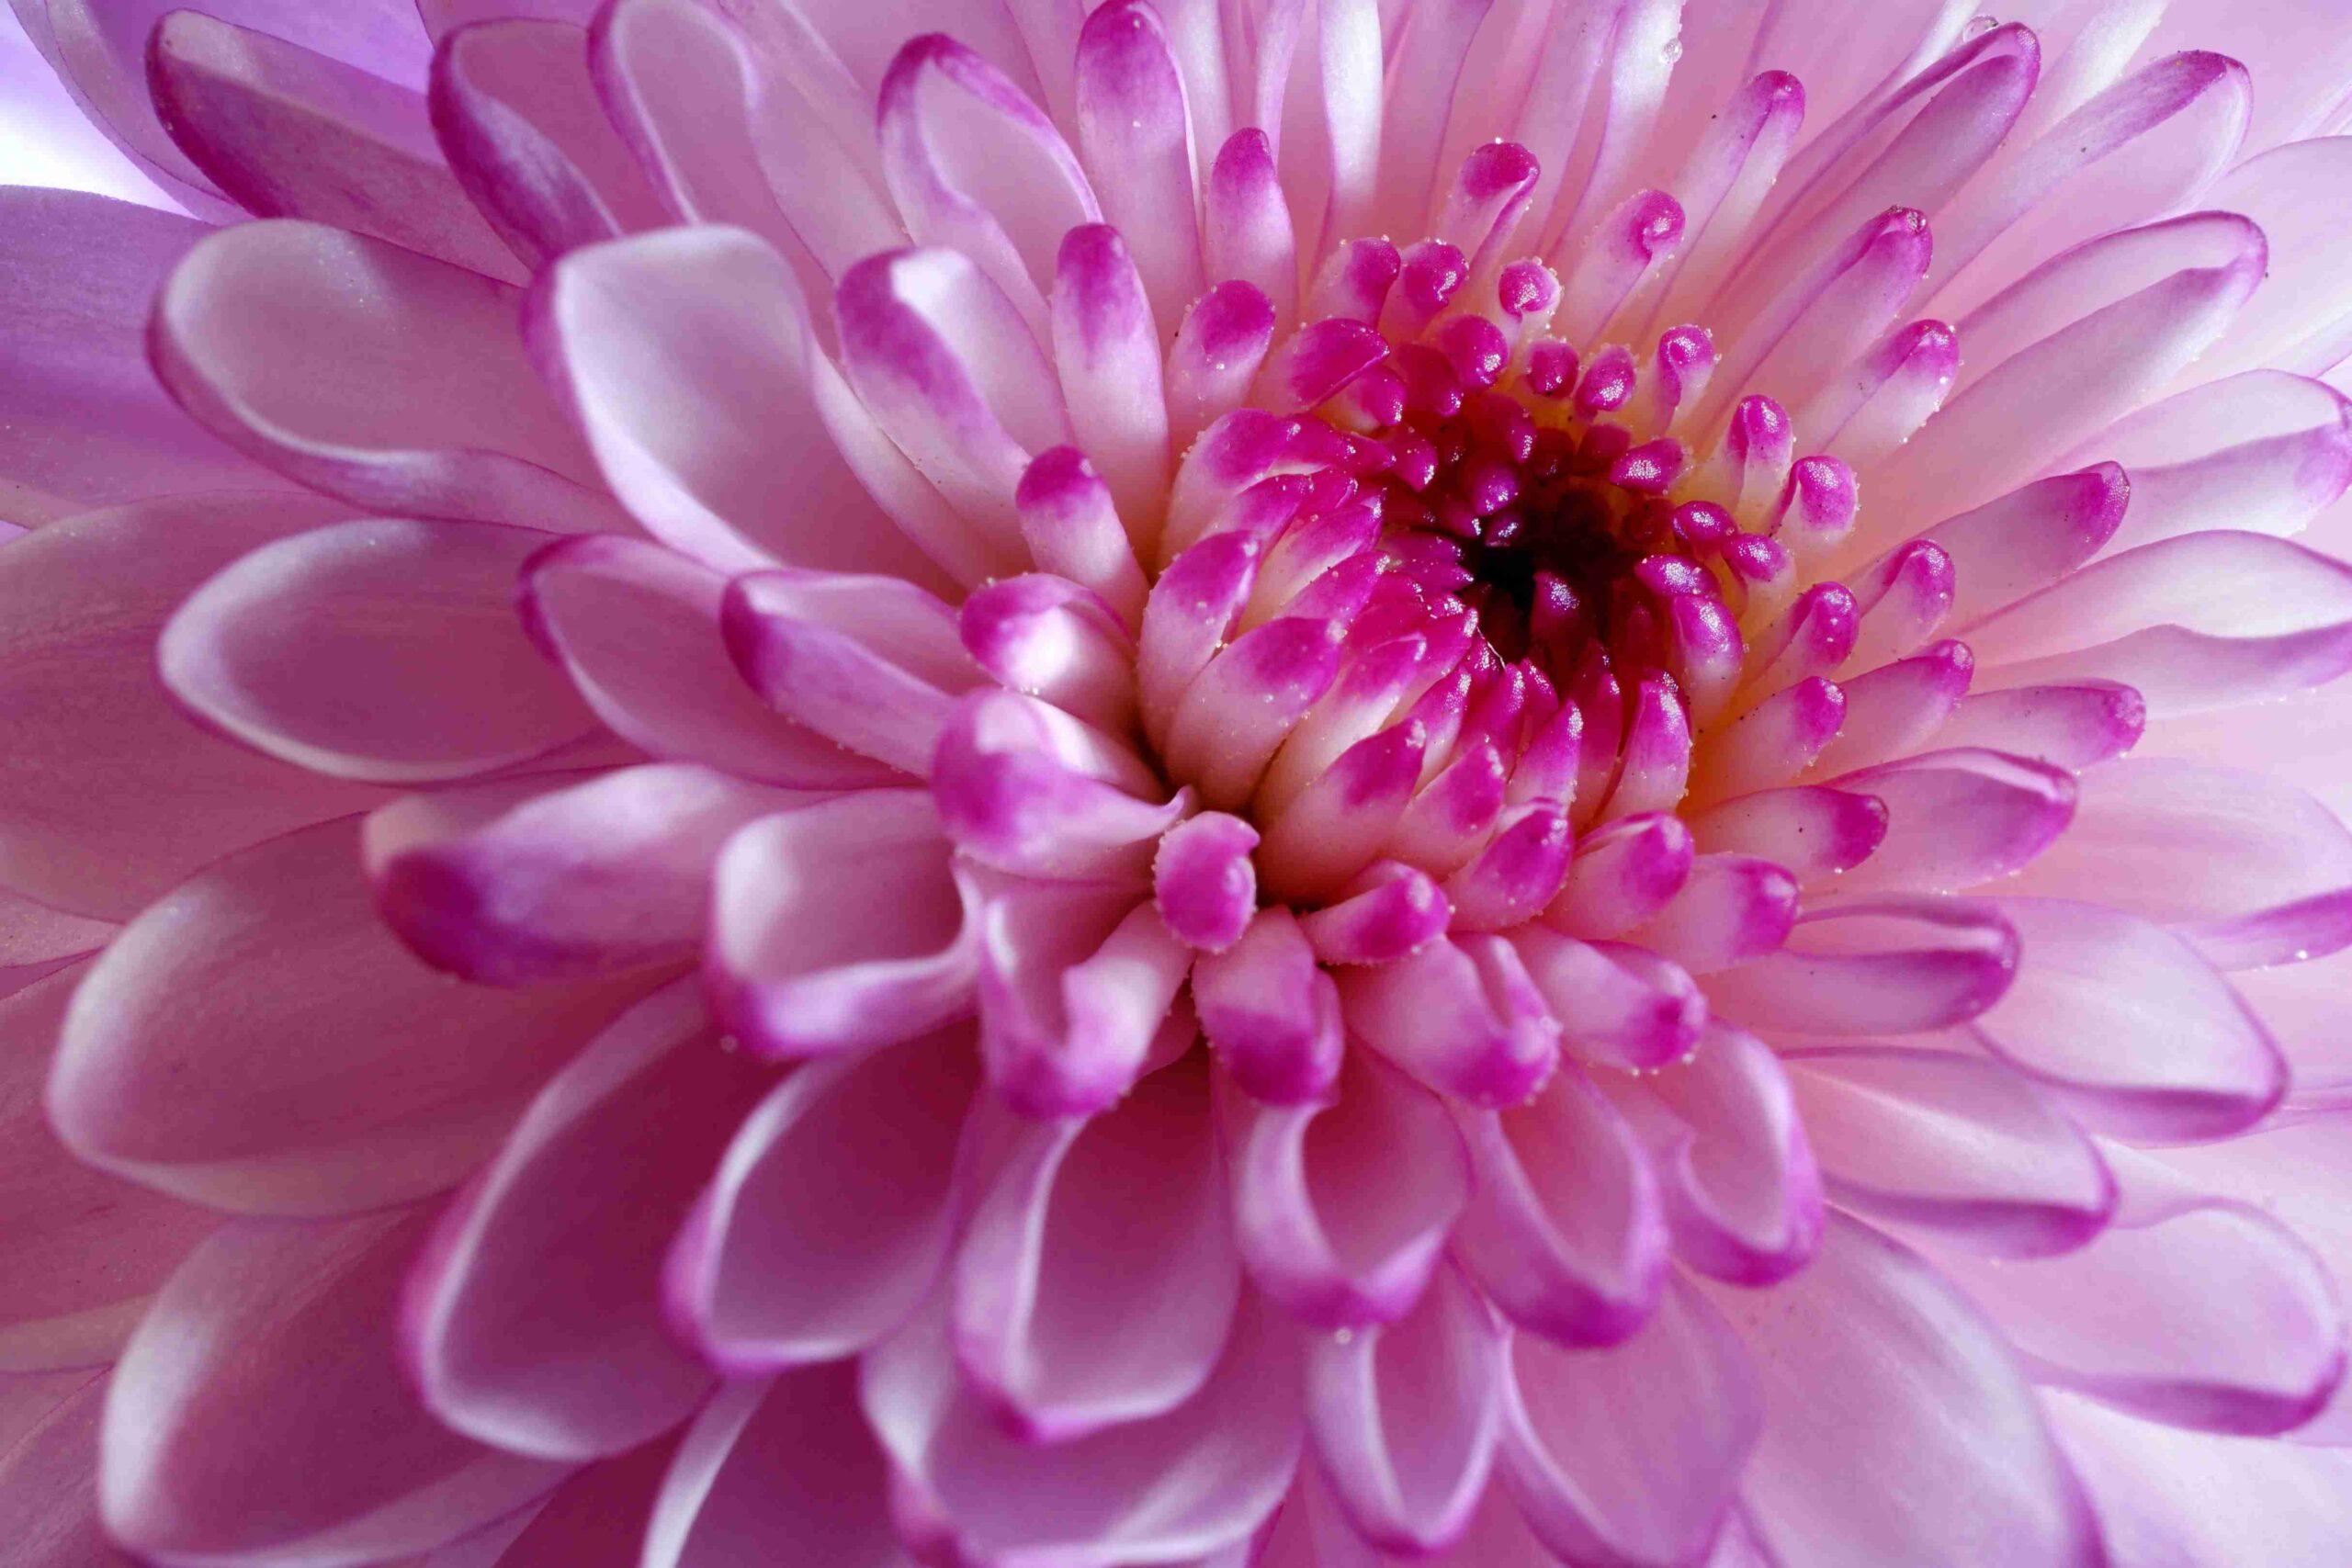 Pink flower opening